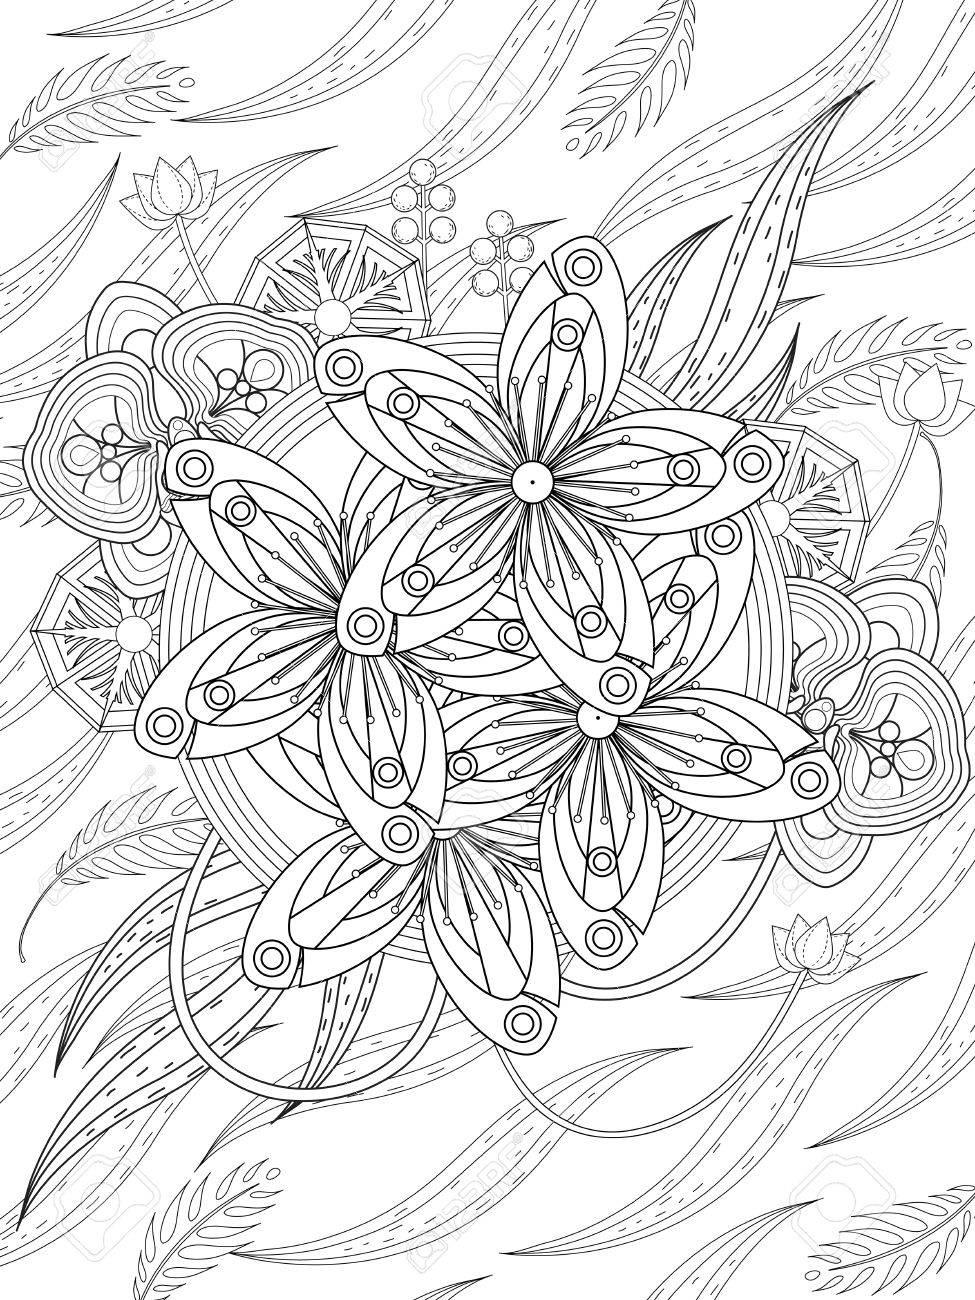 Atractivo Desafiante Flor Para Colorear Adorno - Dibujos Para ...